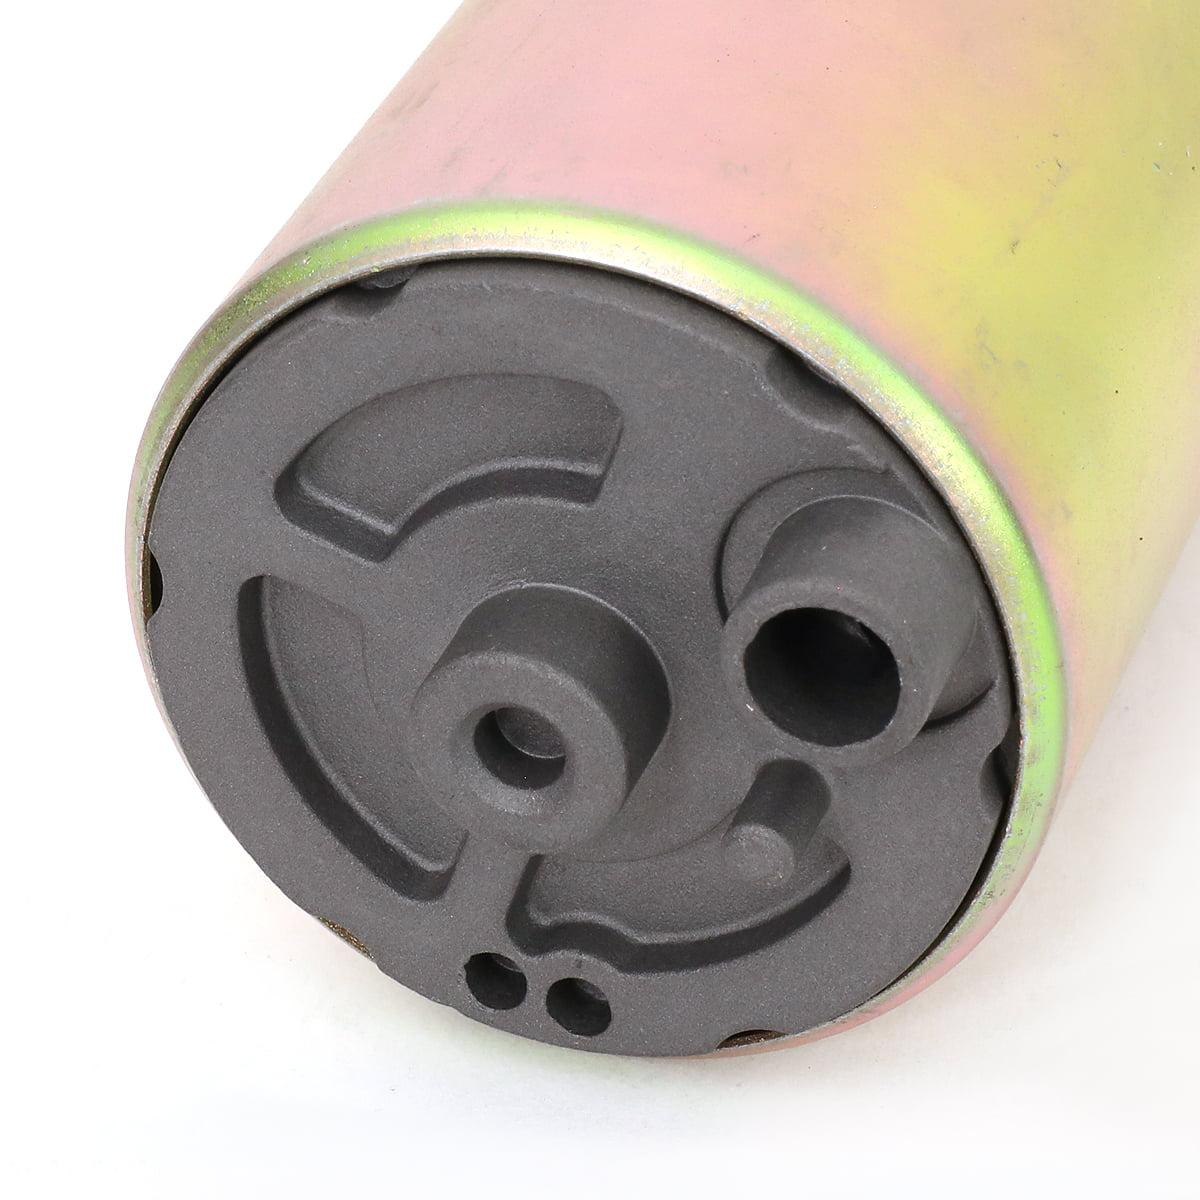 Details about  /Airtex Fuel Pump E8247 For Infiniti Nissan G20 Altima 1993-1999